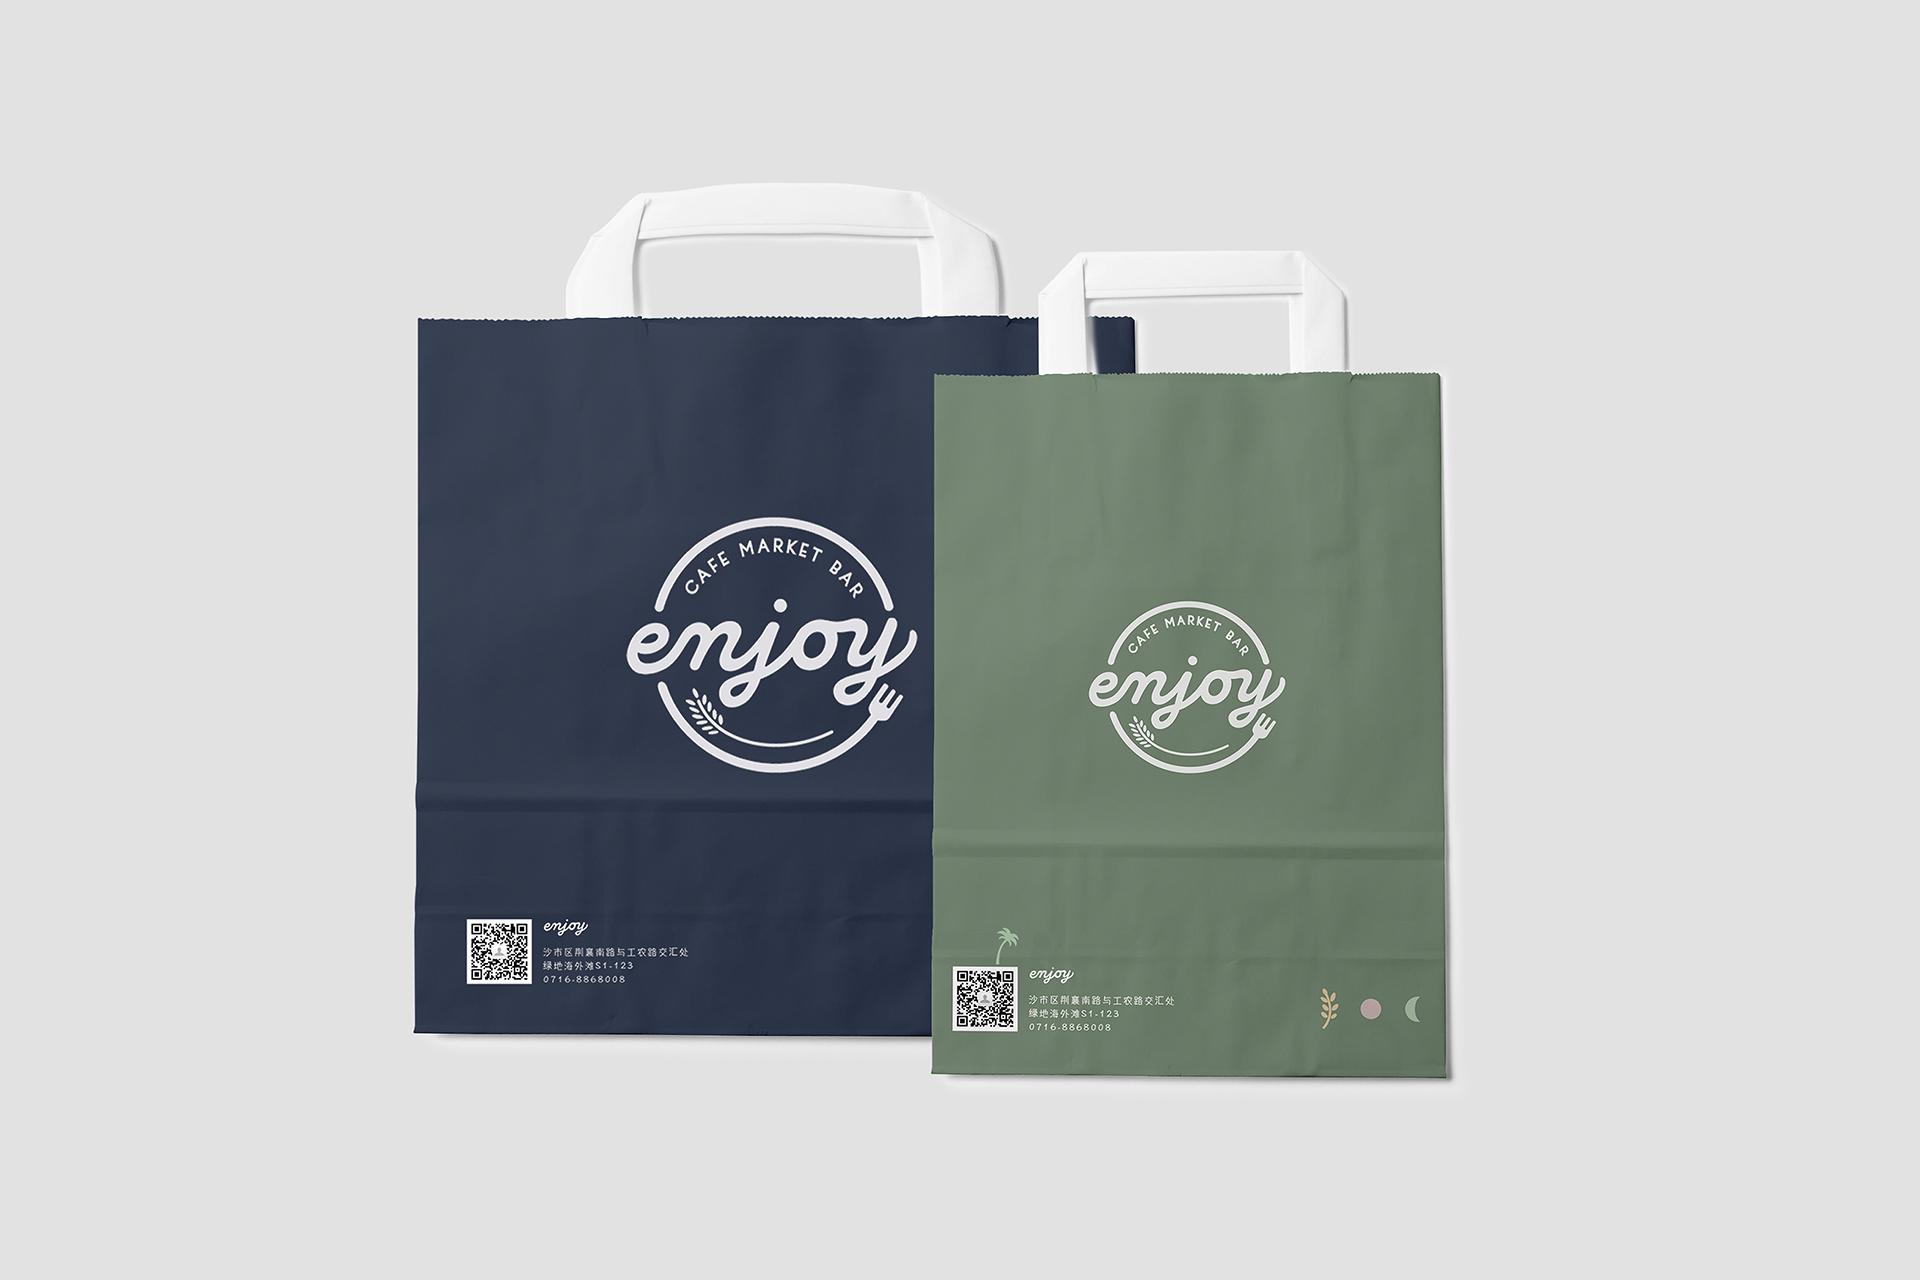 enjoy-04.jpg